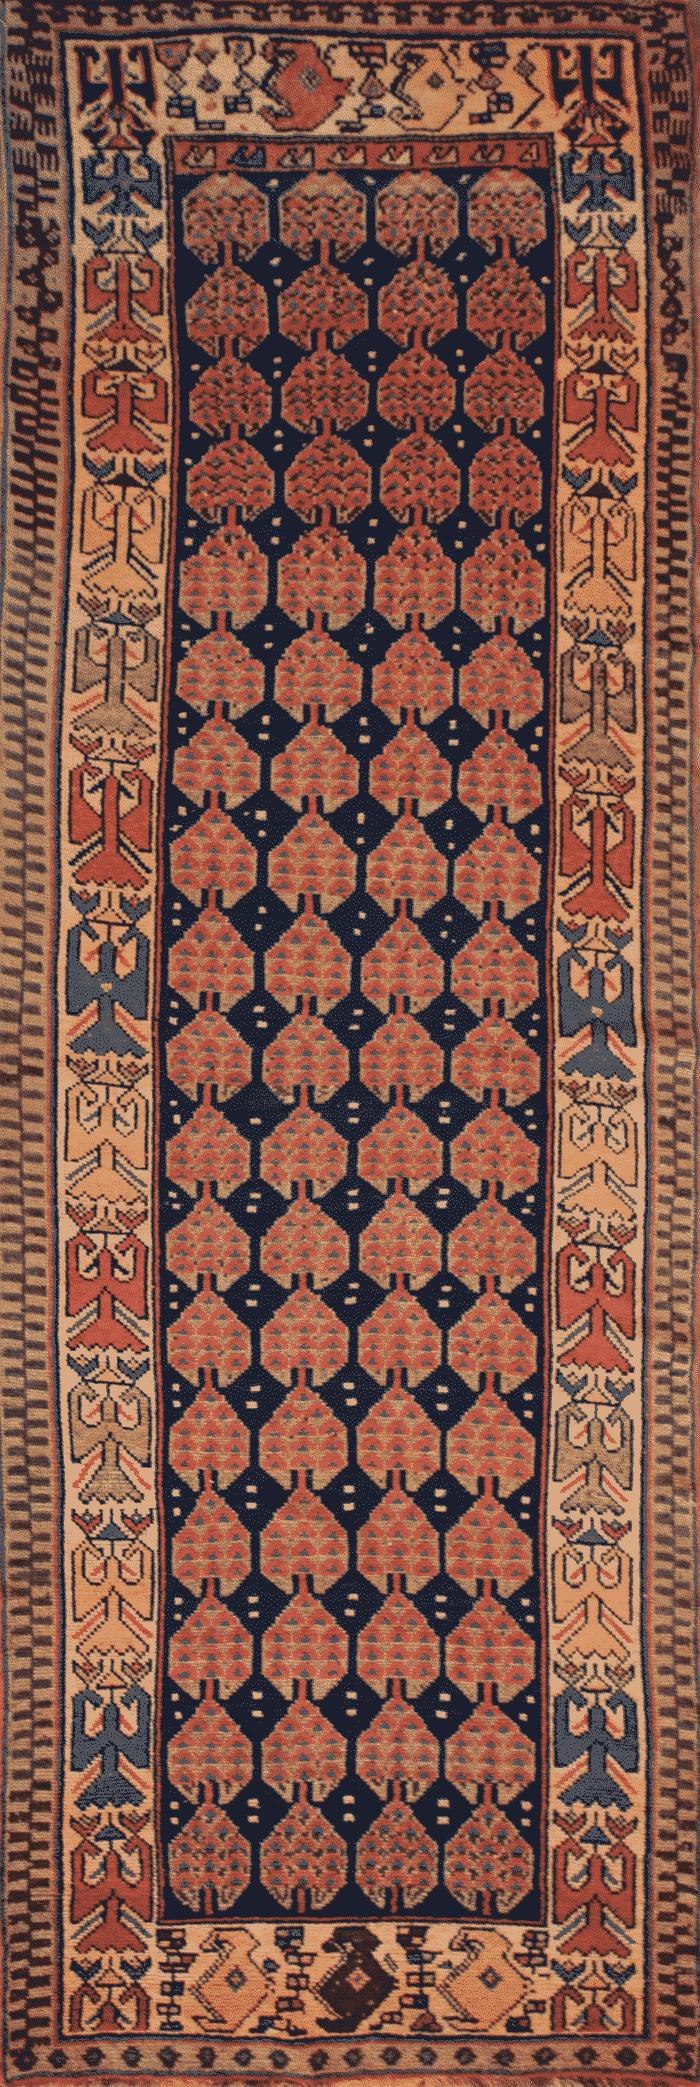 Kurdish 19866 12 5x4 Nilipour Oriental Rugs